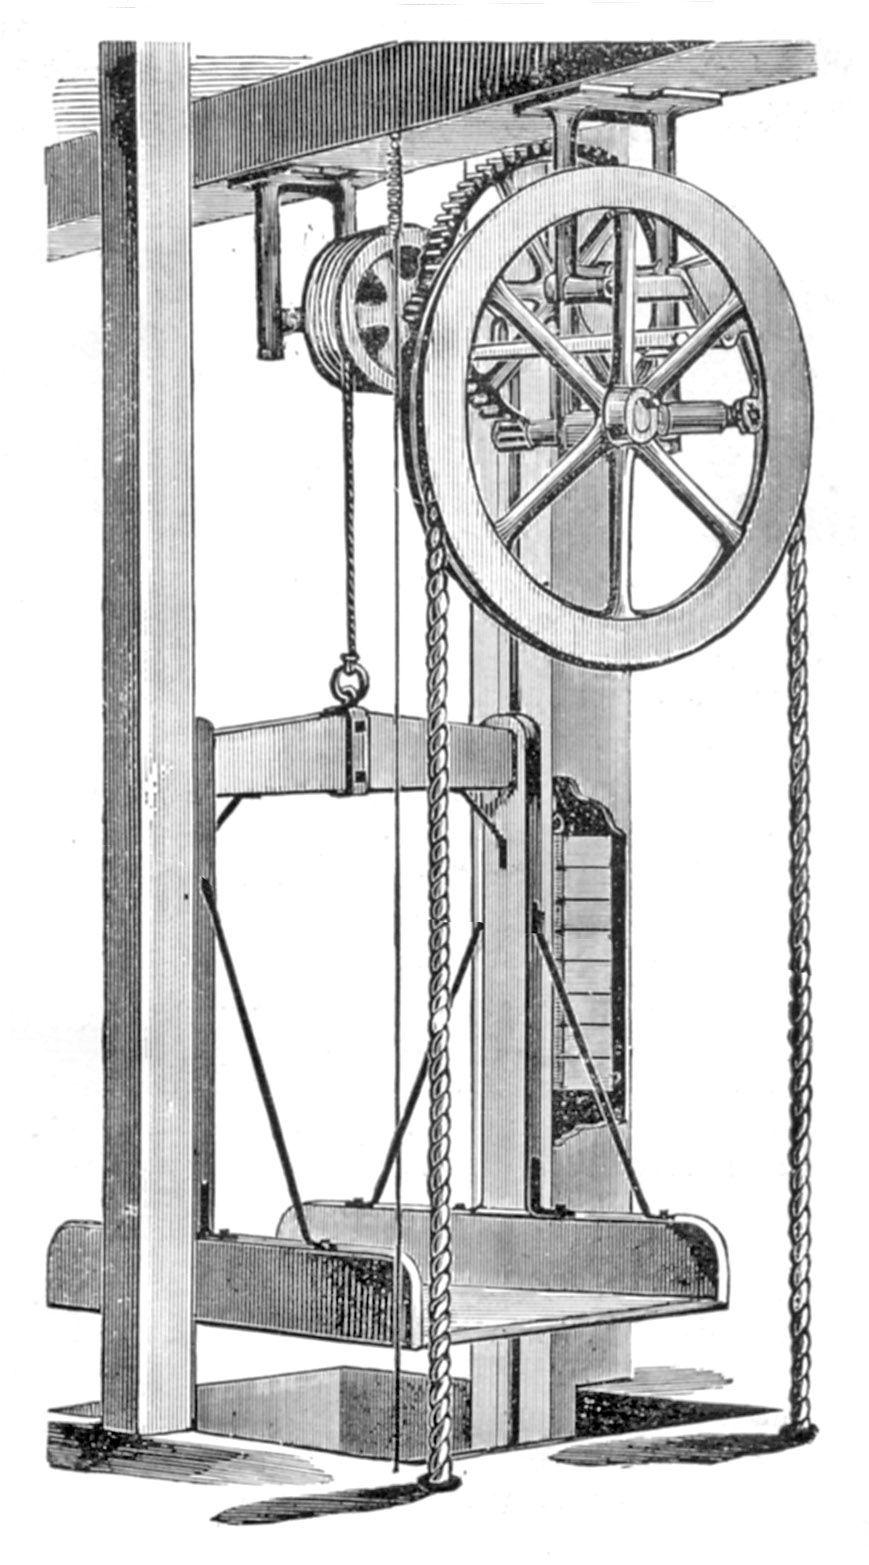 Edwin Harrington Hand Power Elevators Pages 142 143 Elevator Wiring Schematic For Dumb Waiter Design